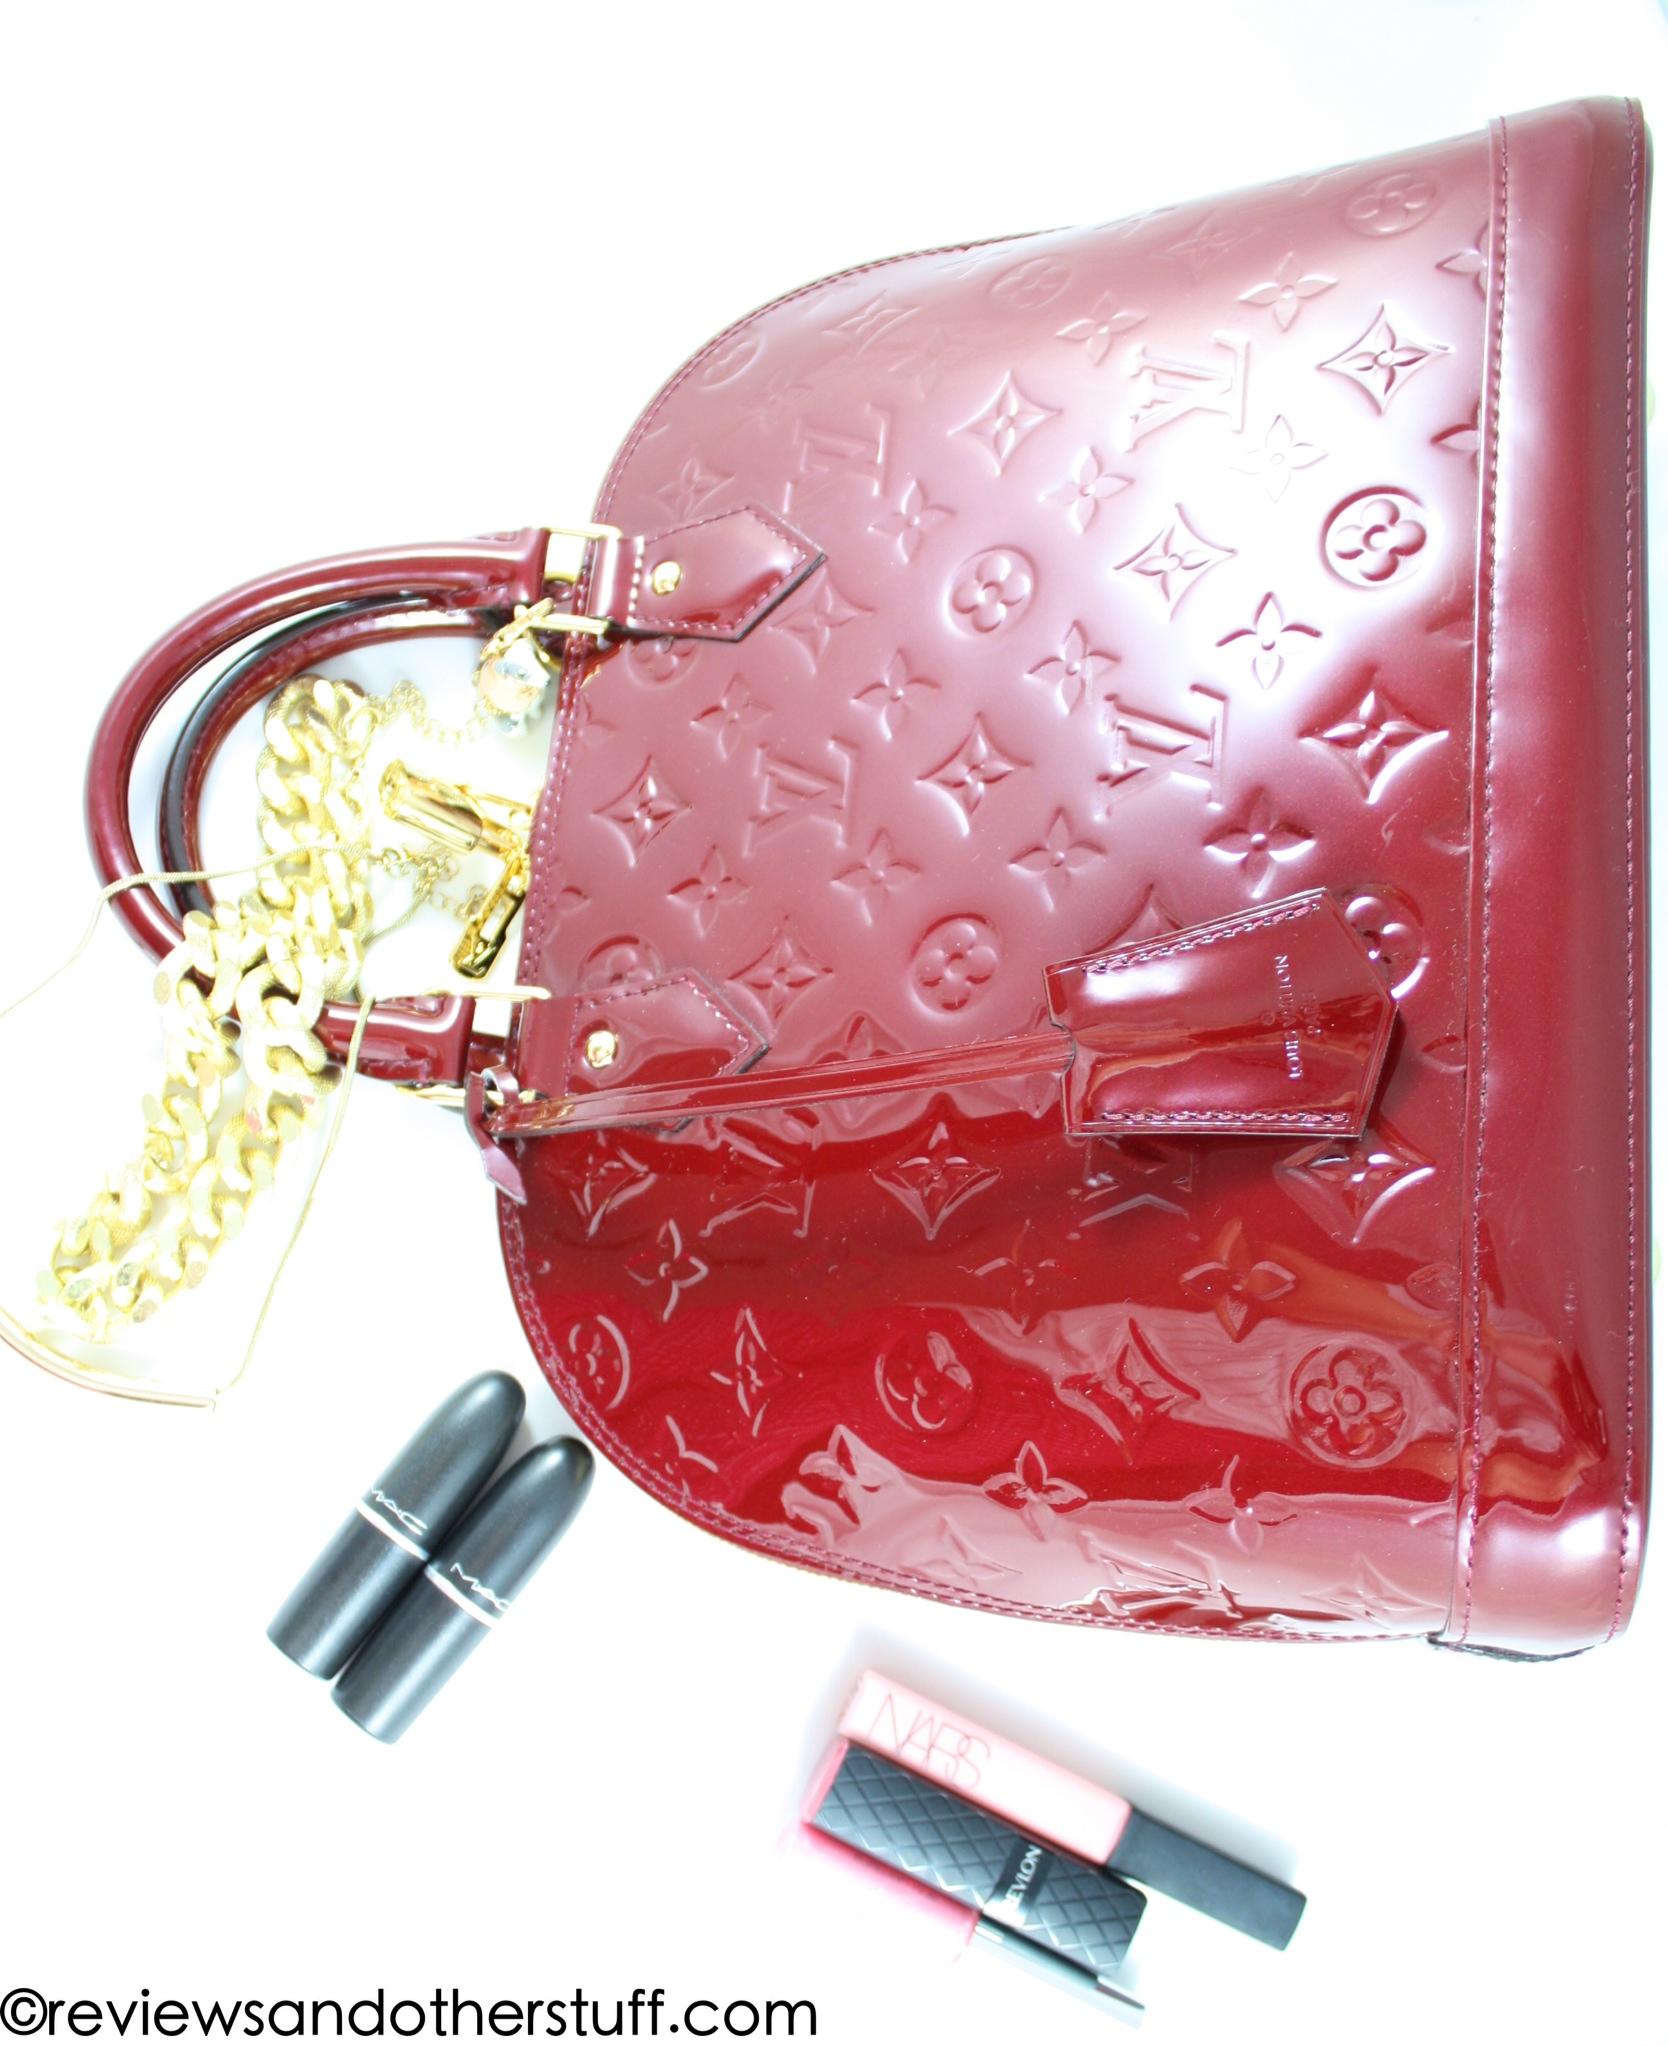 fba7f0020813 Louis Vuitton Alma PM in Monogram Vernis Leather